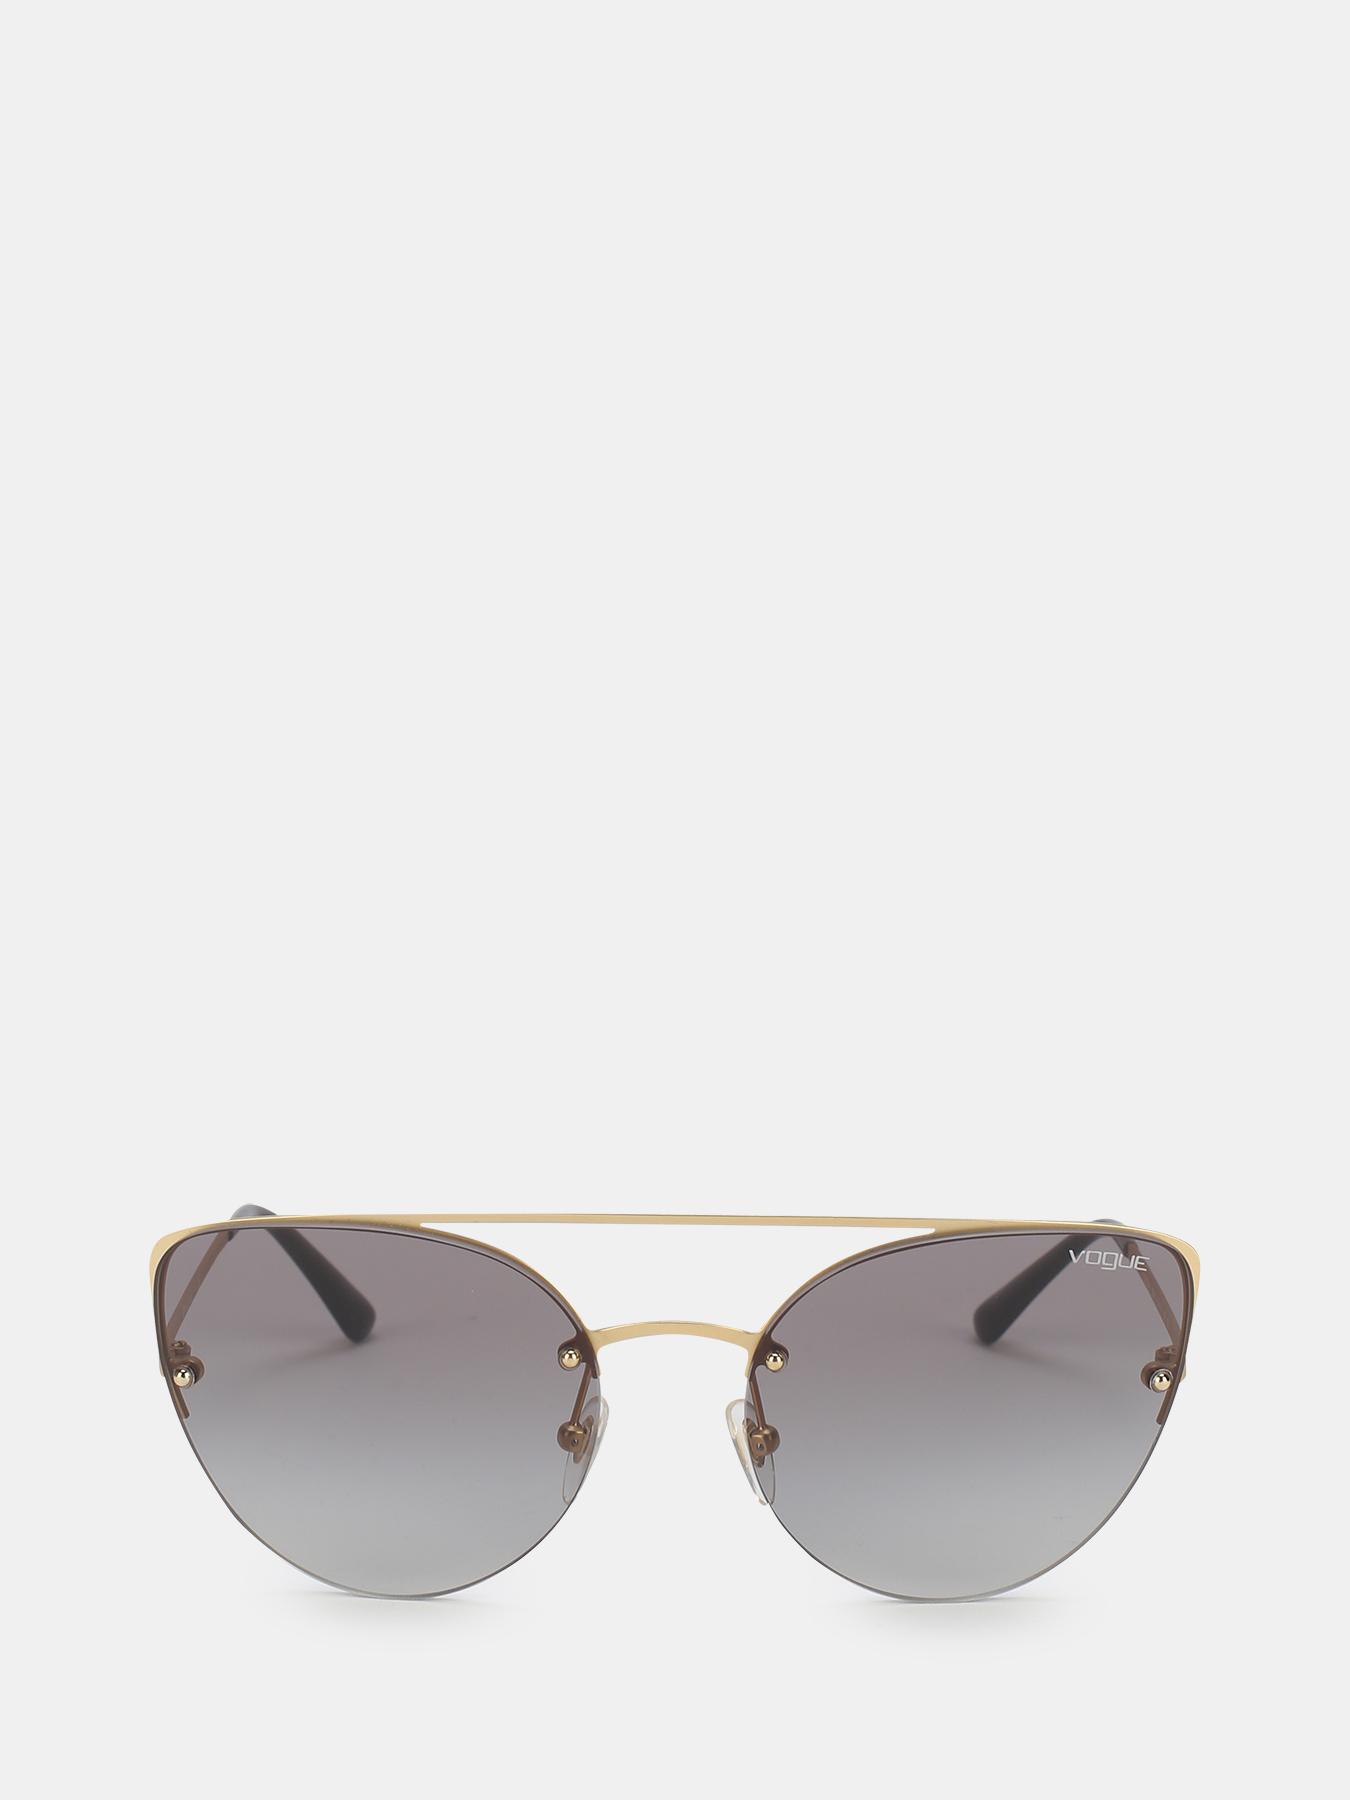 цена на Очки VOGUE Солнцезащитные очки